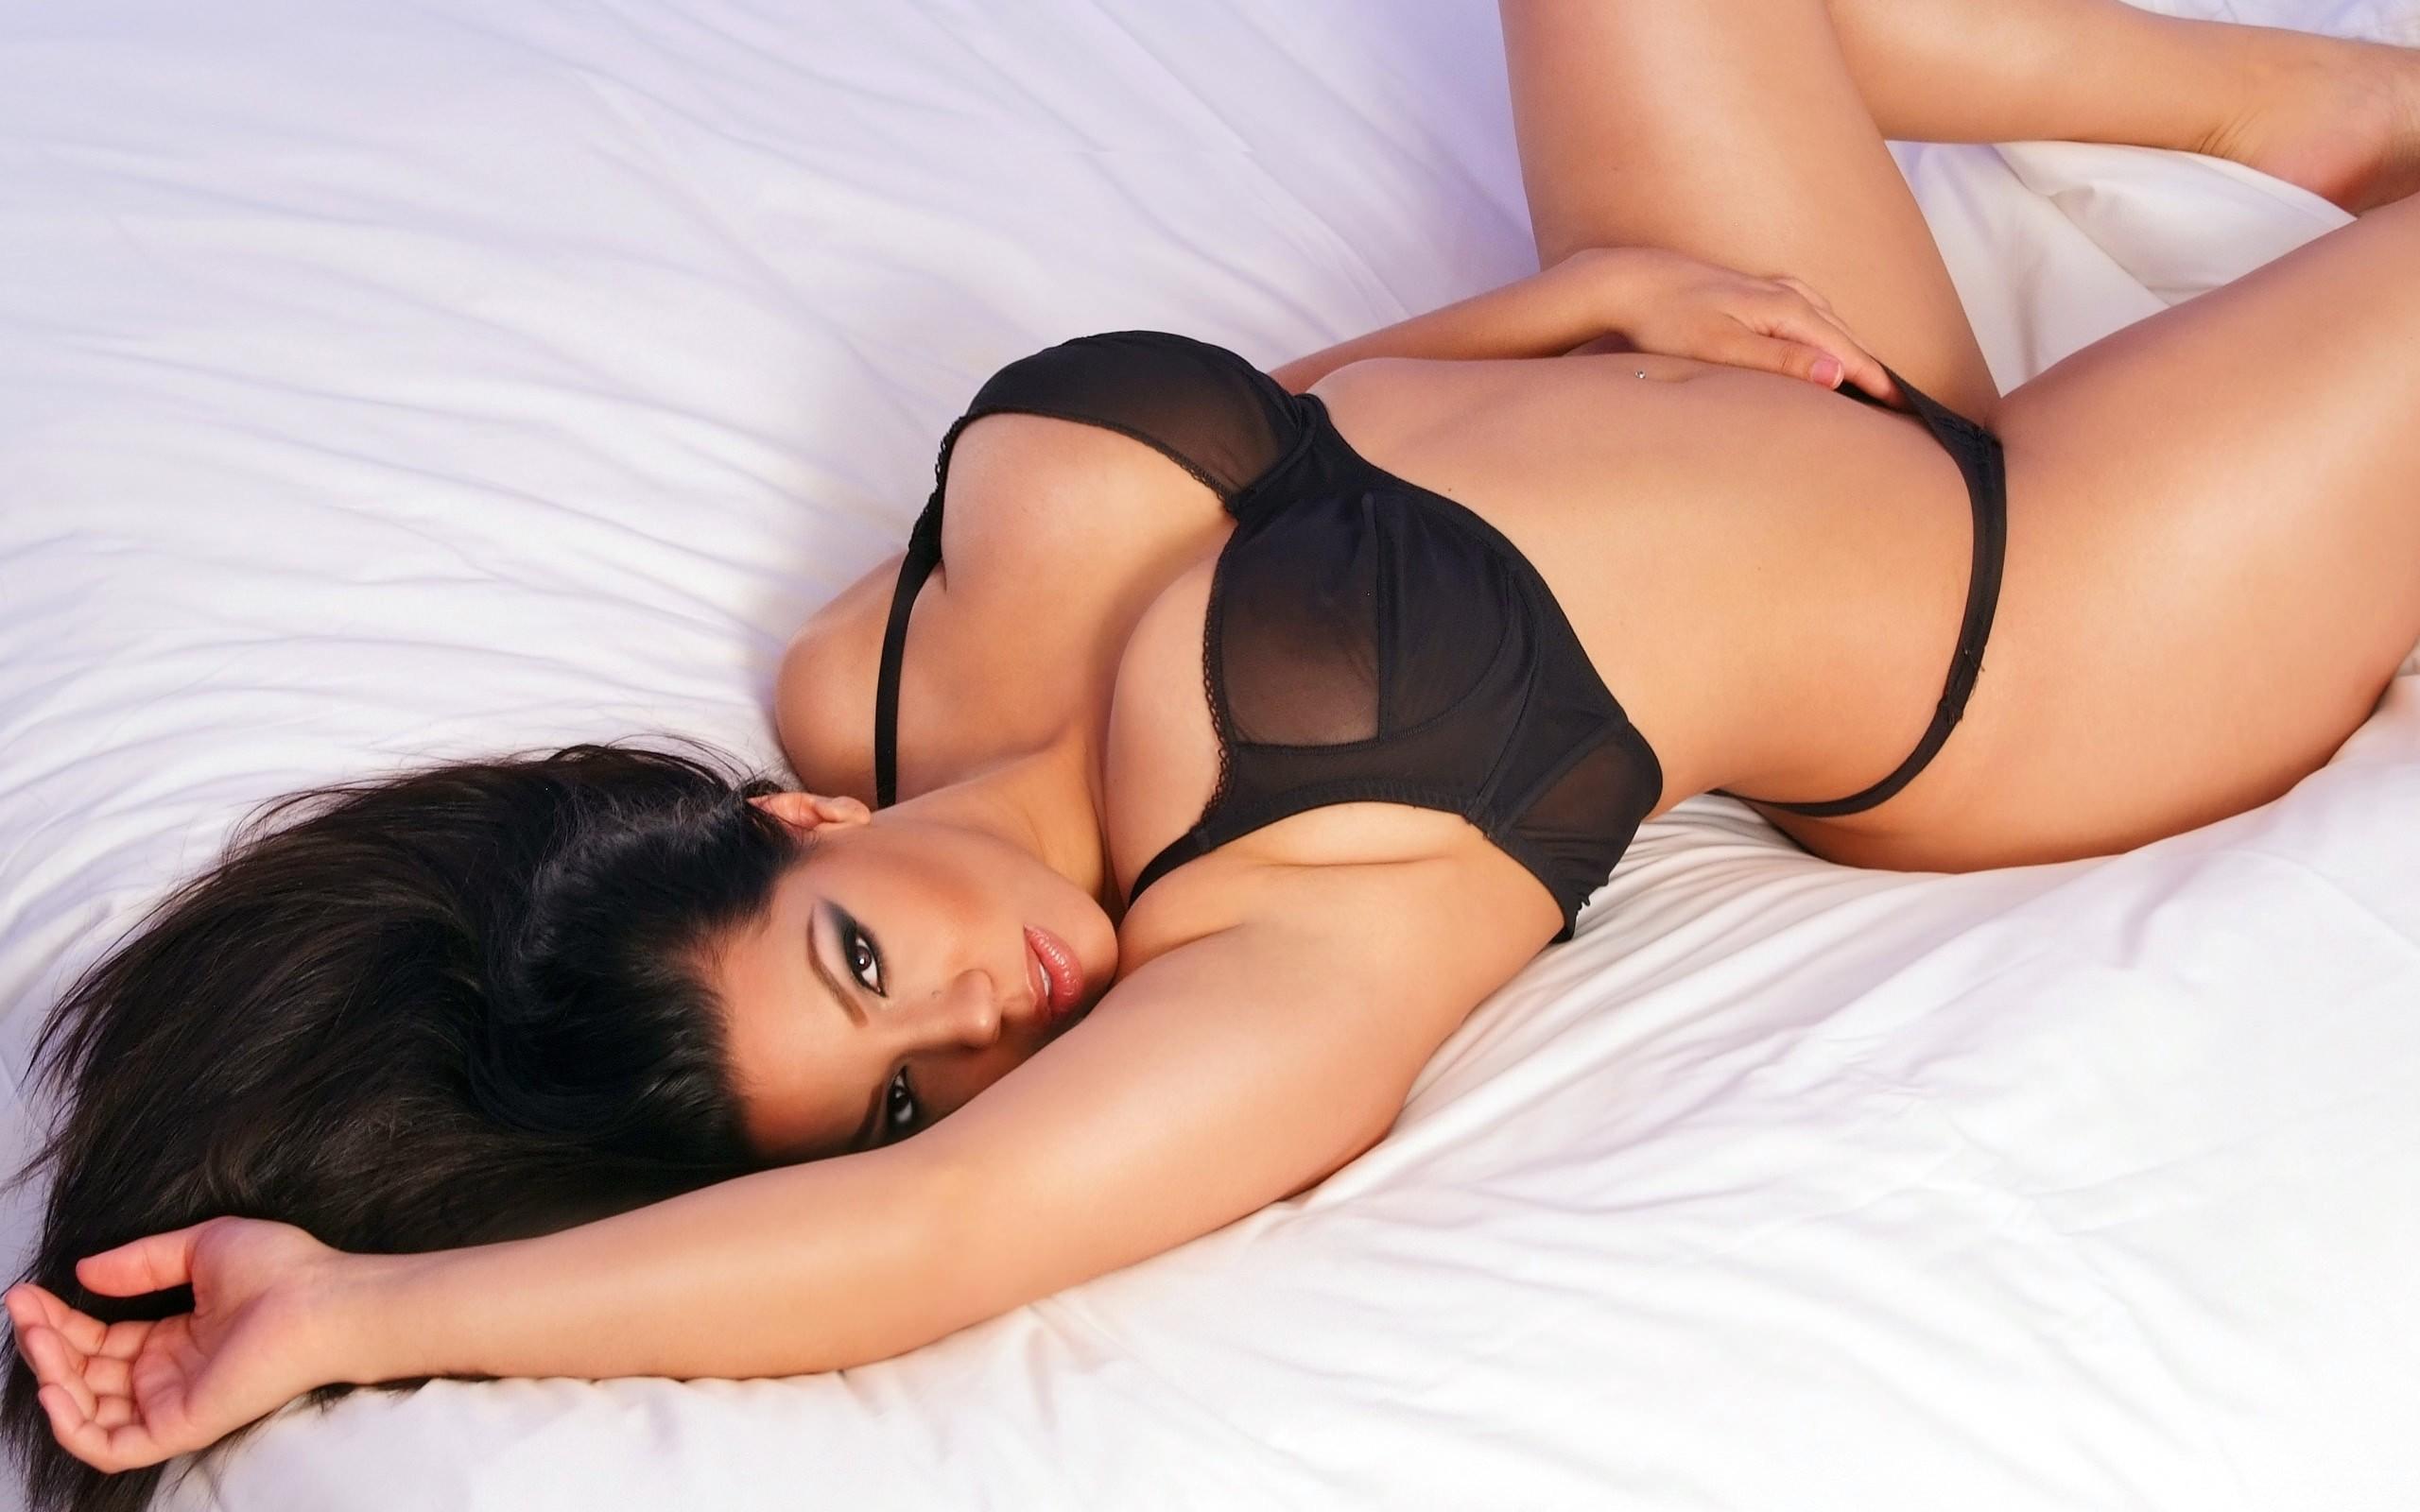 Cassie dos santos london's sexiest independent ebony escort